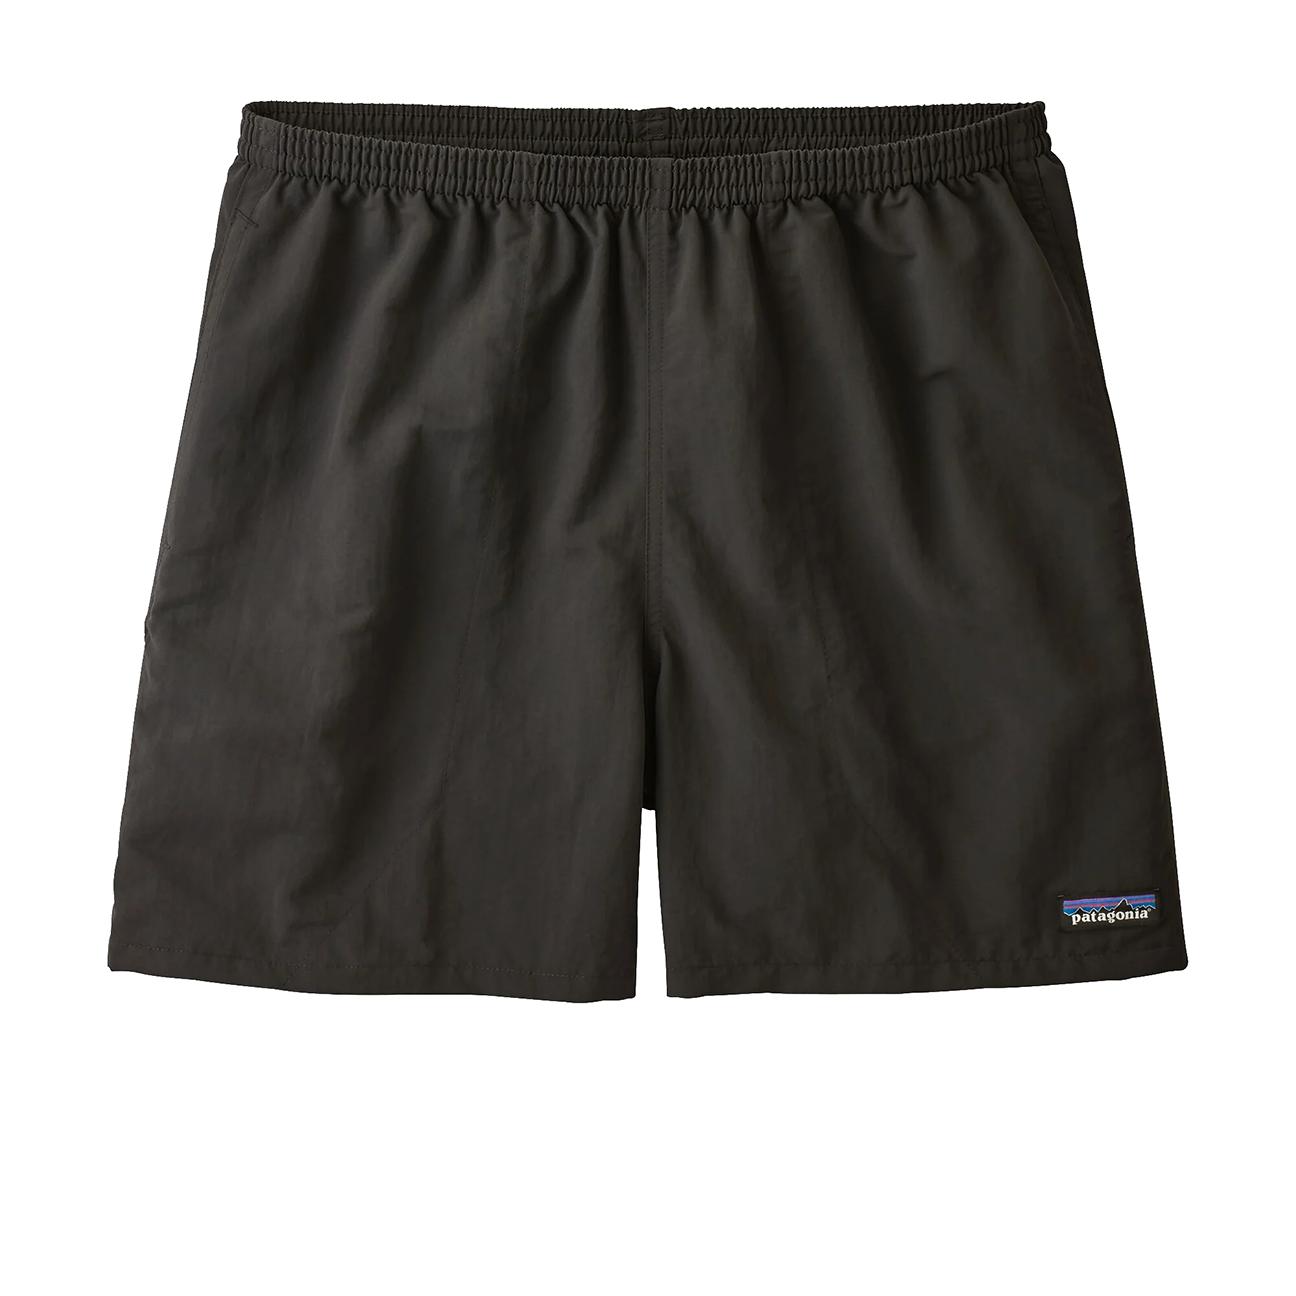 "Men's Baggies Shorts - 5"", Black-1"